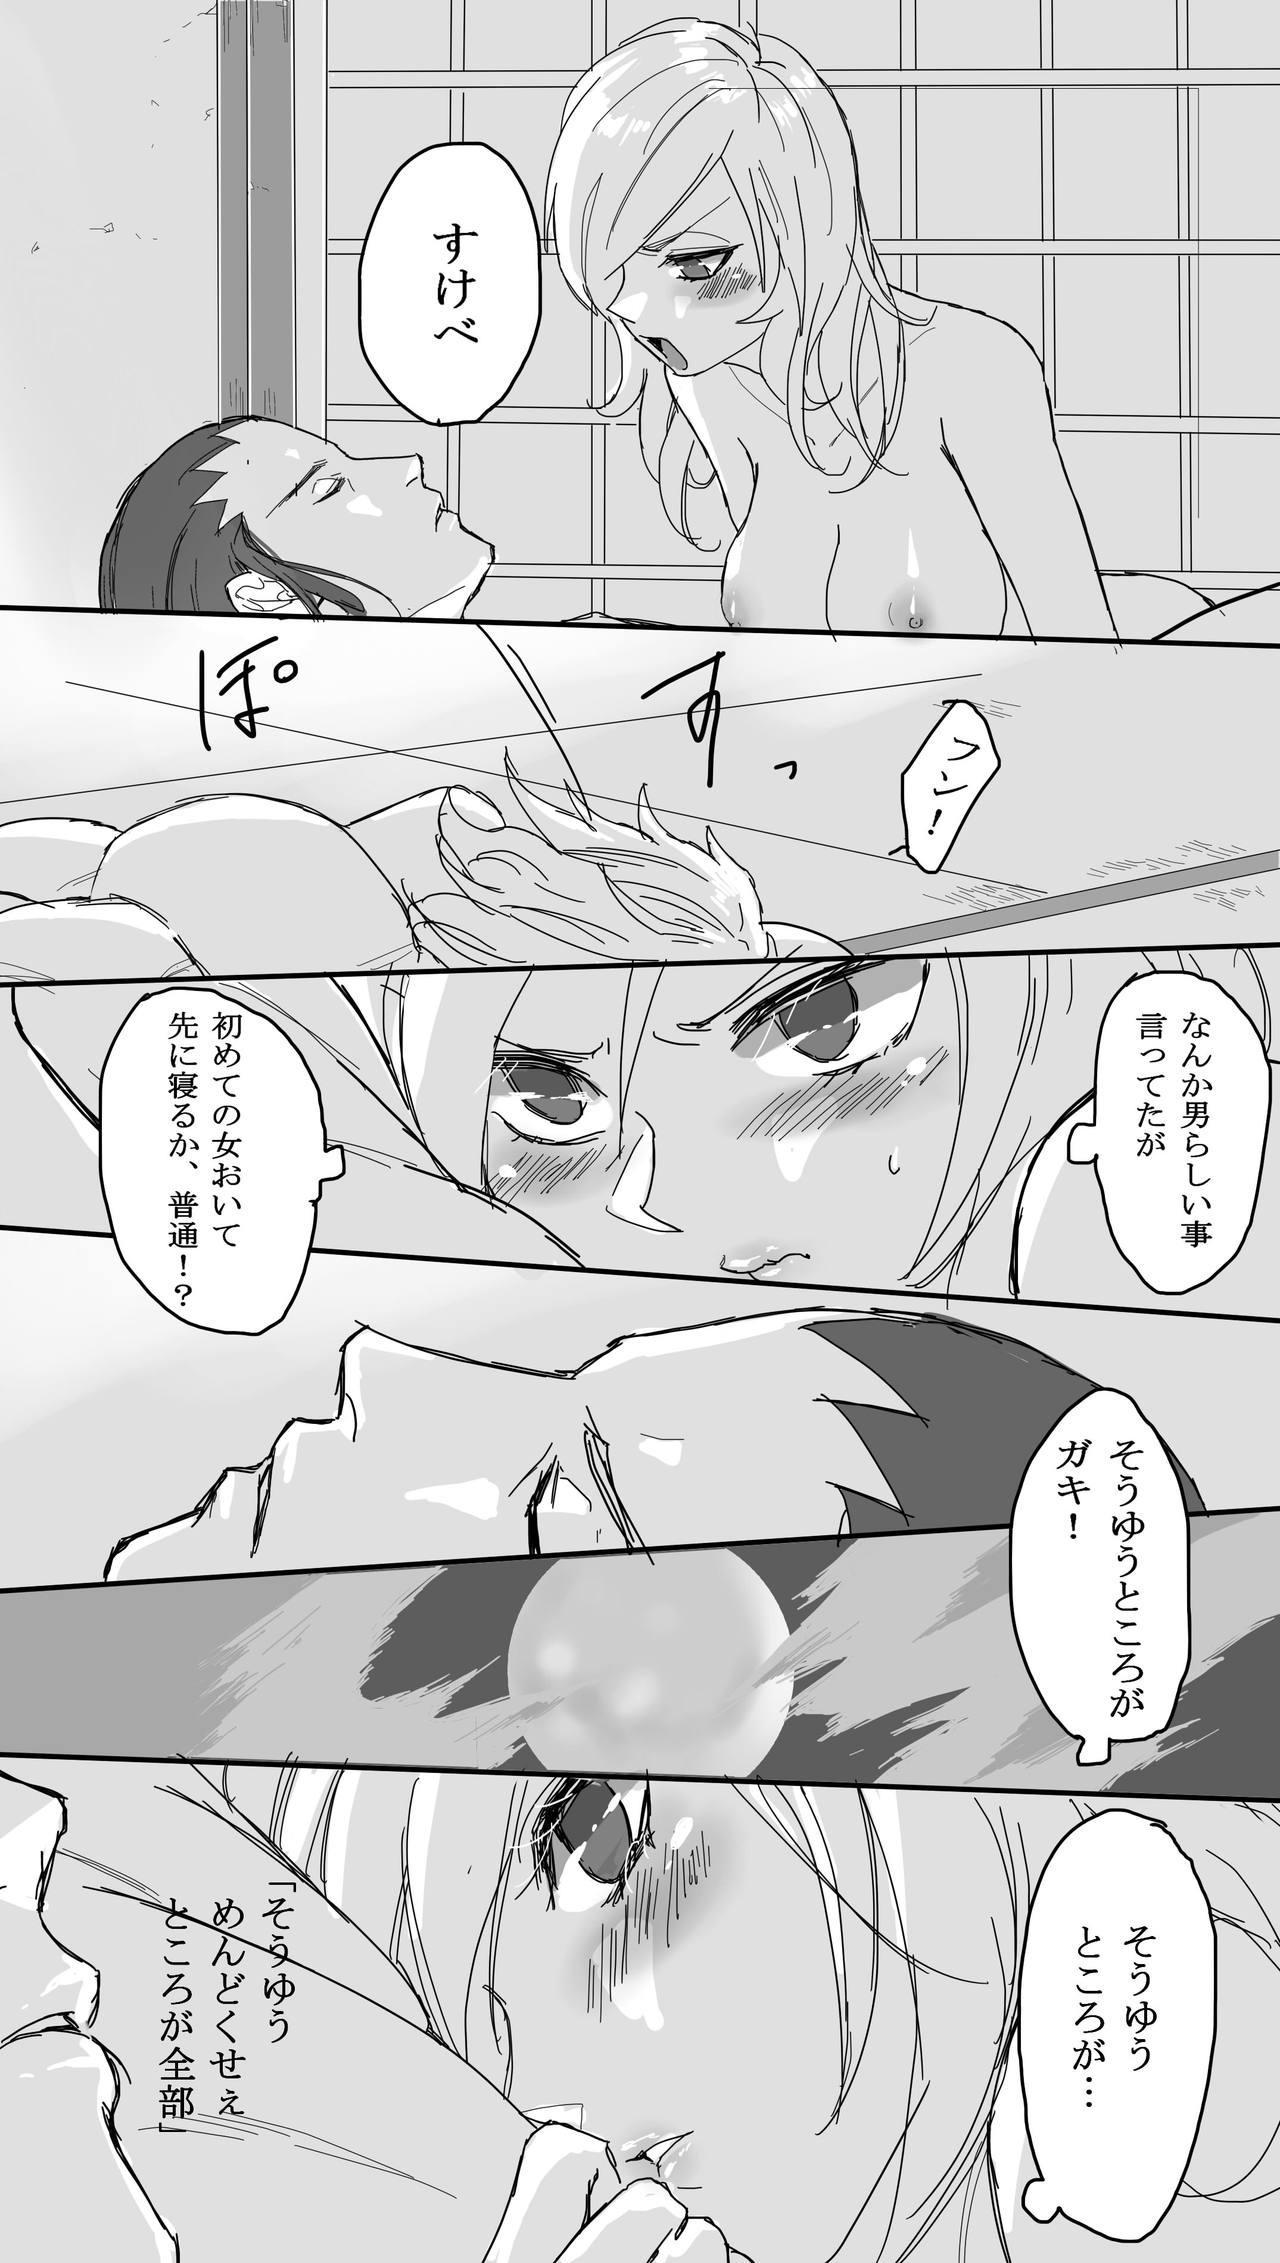 Shikamaru 's birthday celebration! - ShikaTema R18 doujinshi 22